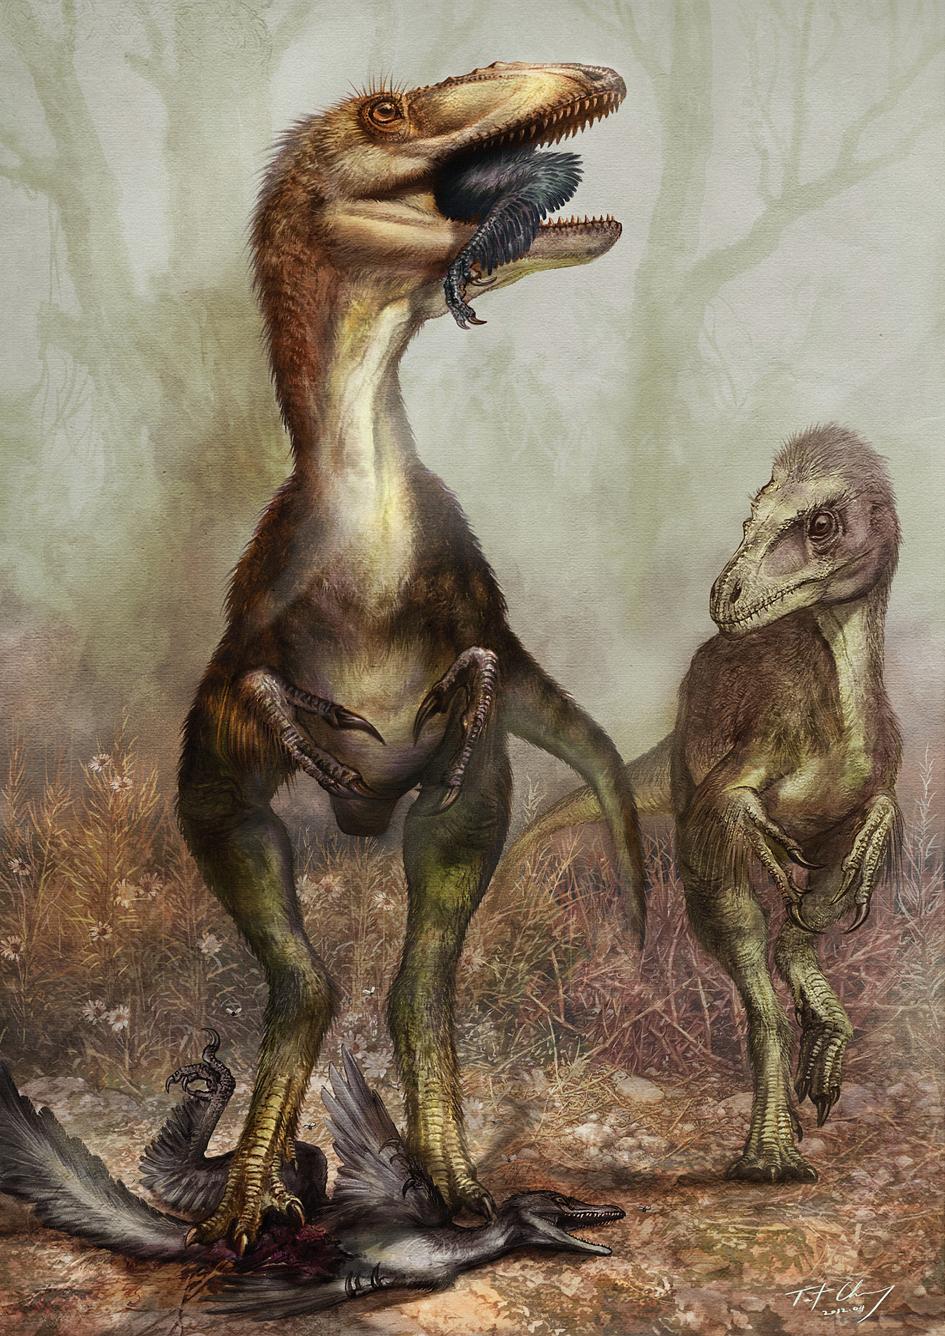 http://upload.wikimedia.org/wikipedia/commons/b/bc/Sinocalliopteryx_gigas_feeding_on_the_dromaeosaur_Sinornithosaurus_-_journal.pone.0044012.g008.png